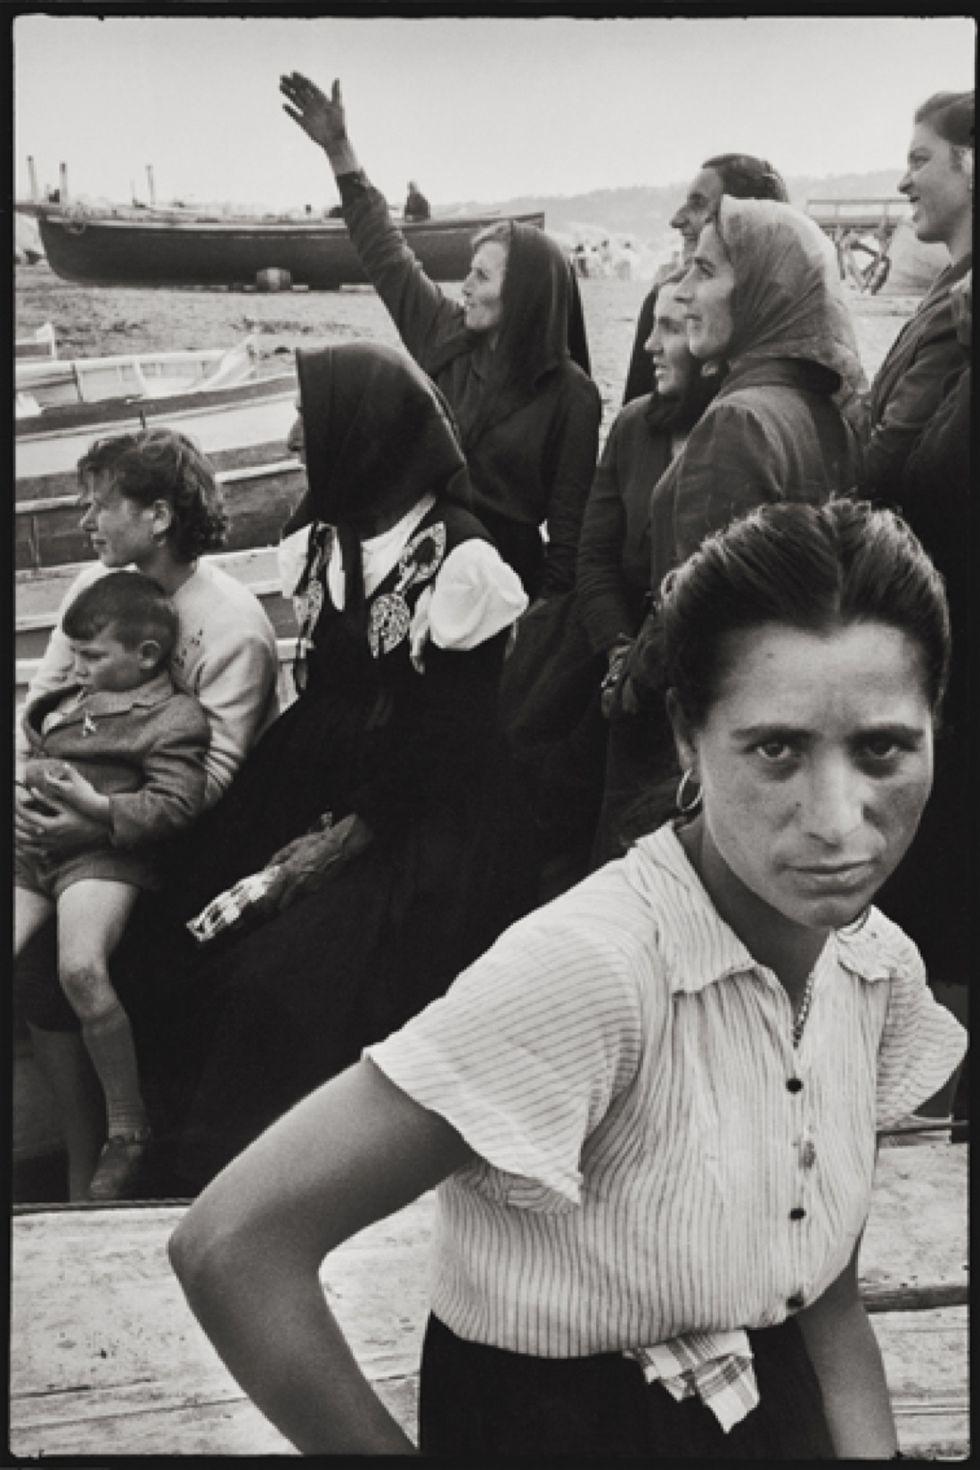 Leonard Freed, Napoli, 1956